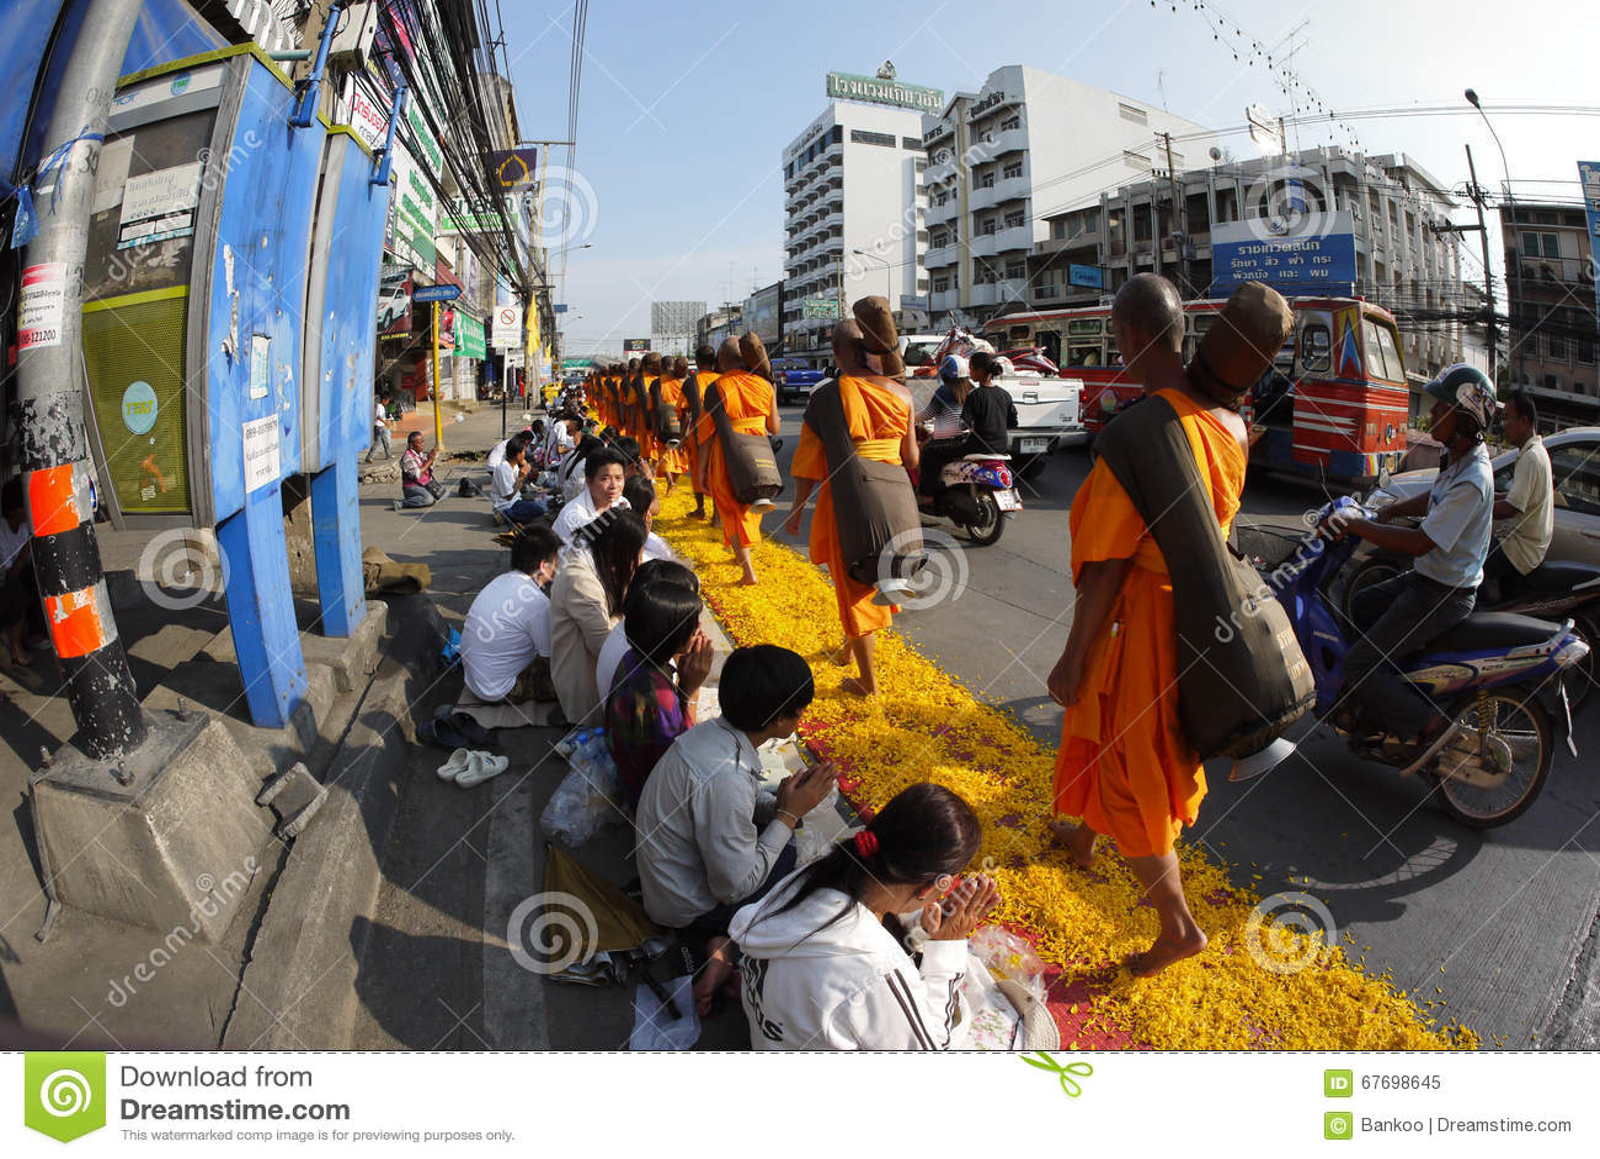 Thousand Monks From Wat Phra Dhammakaya Editorial Image Image Of